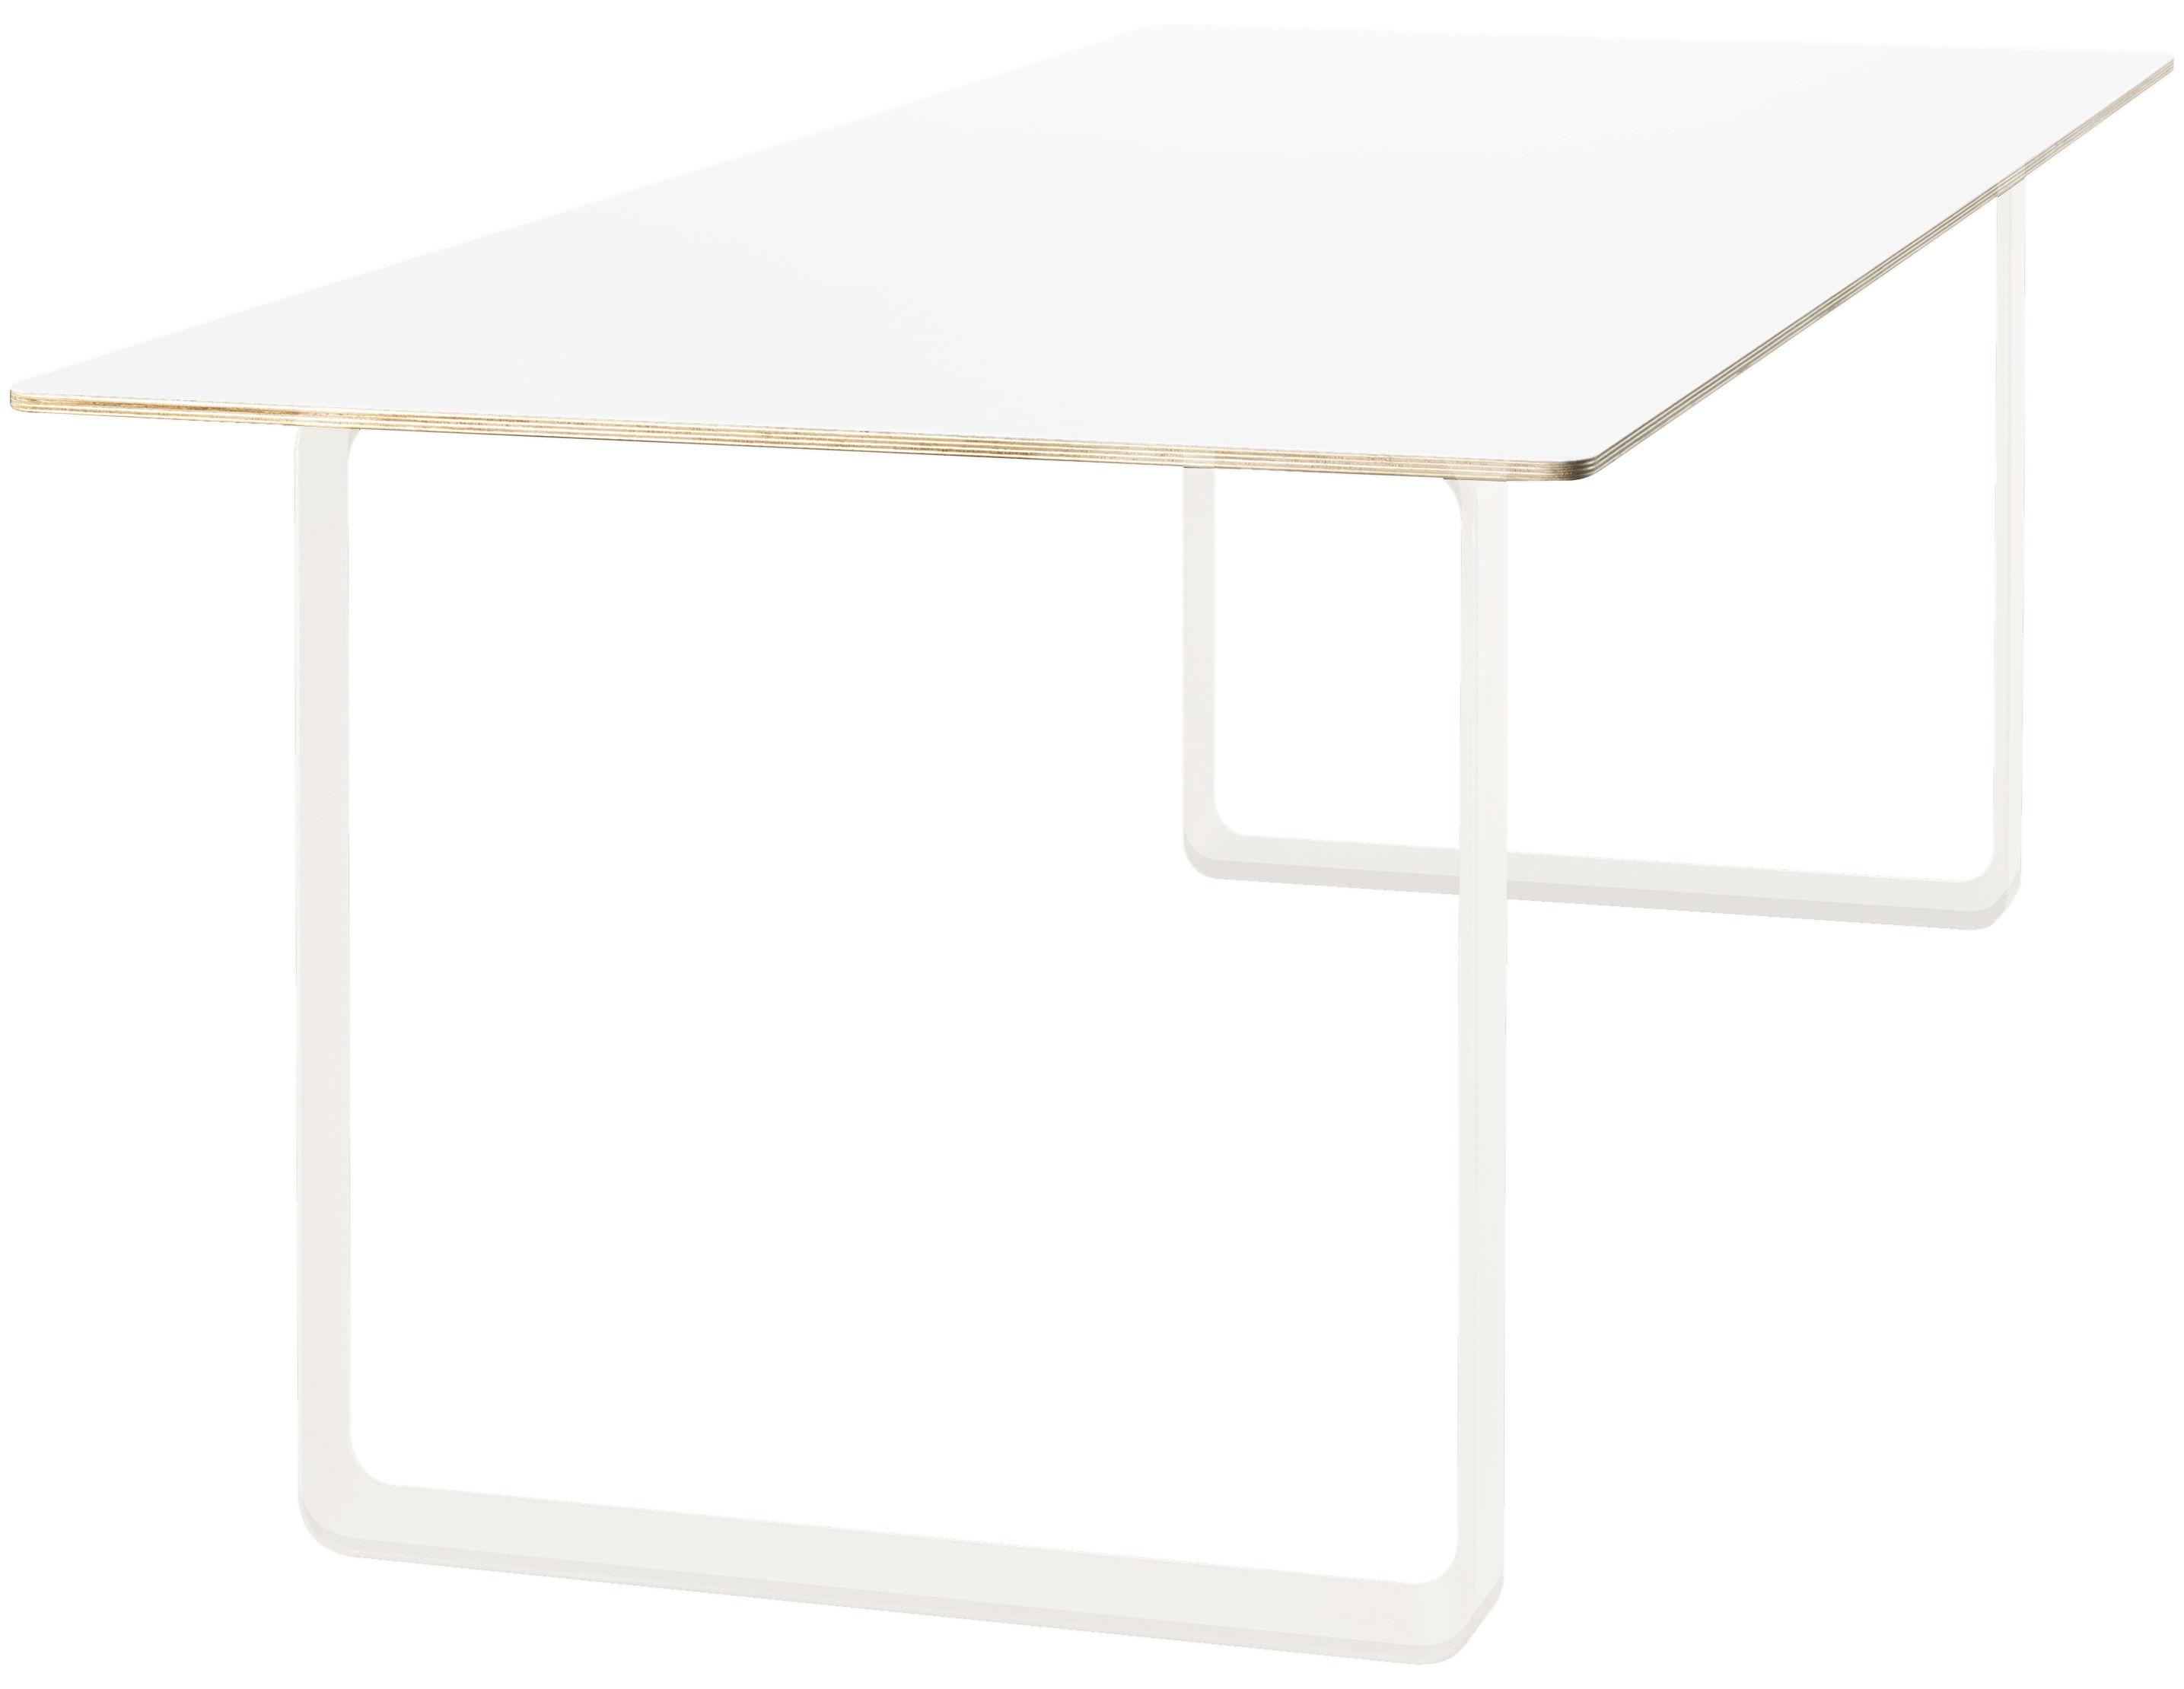 Mobilier - Tables - Table 70-70 / 225 x 90 cm - Muuto - Blanc - Aluminium, Contreplaqué, Mélamine